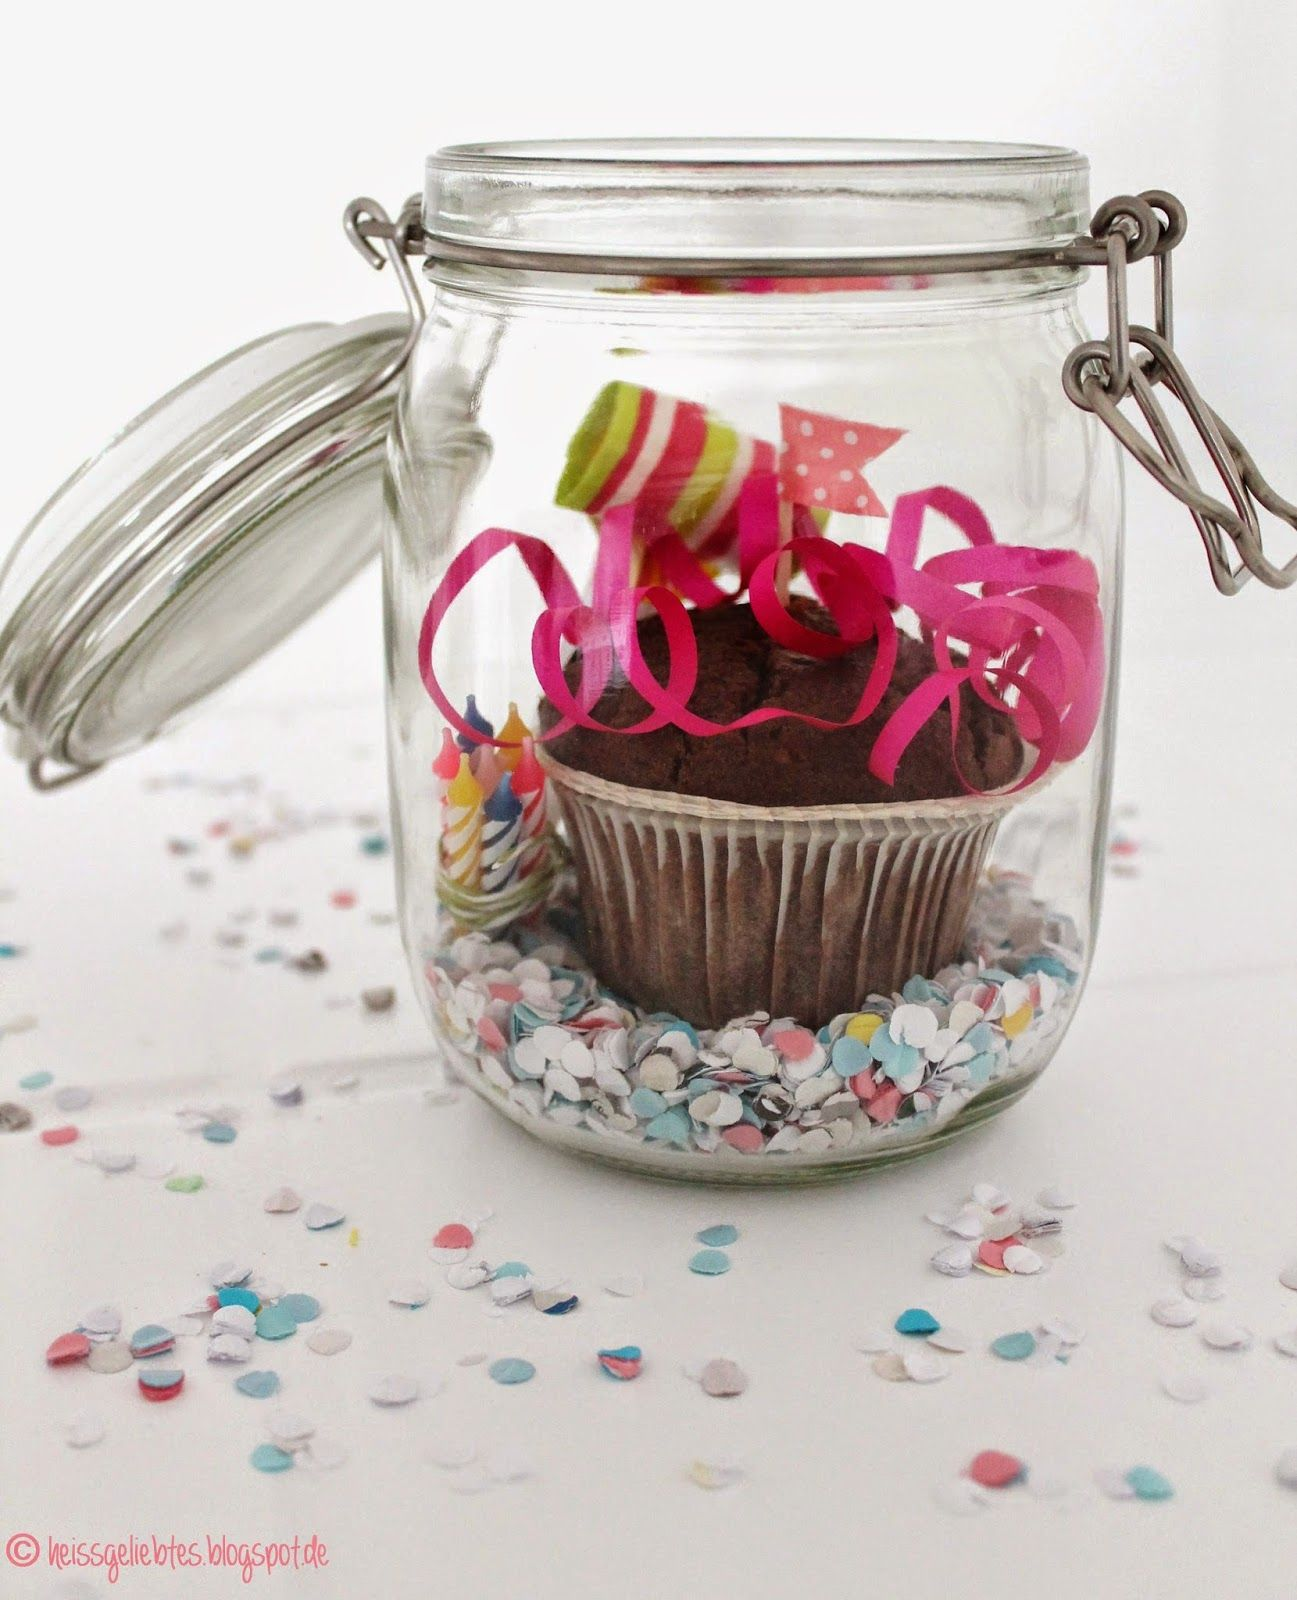 diy birthday in a jar geburtstag im glas muffin gift. Black Bedroom Furniture Sets. Home Design Ideas